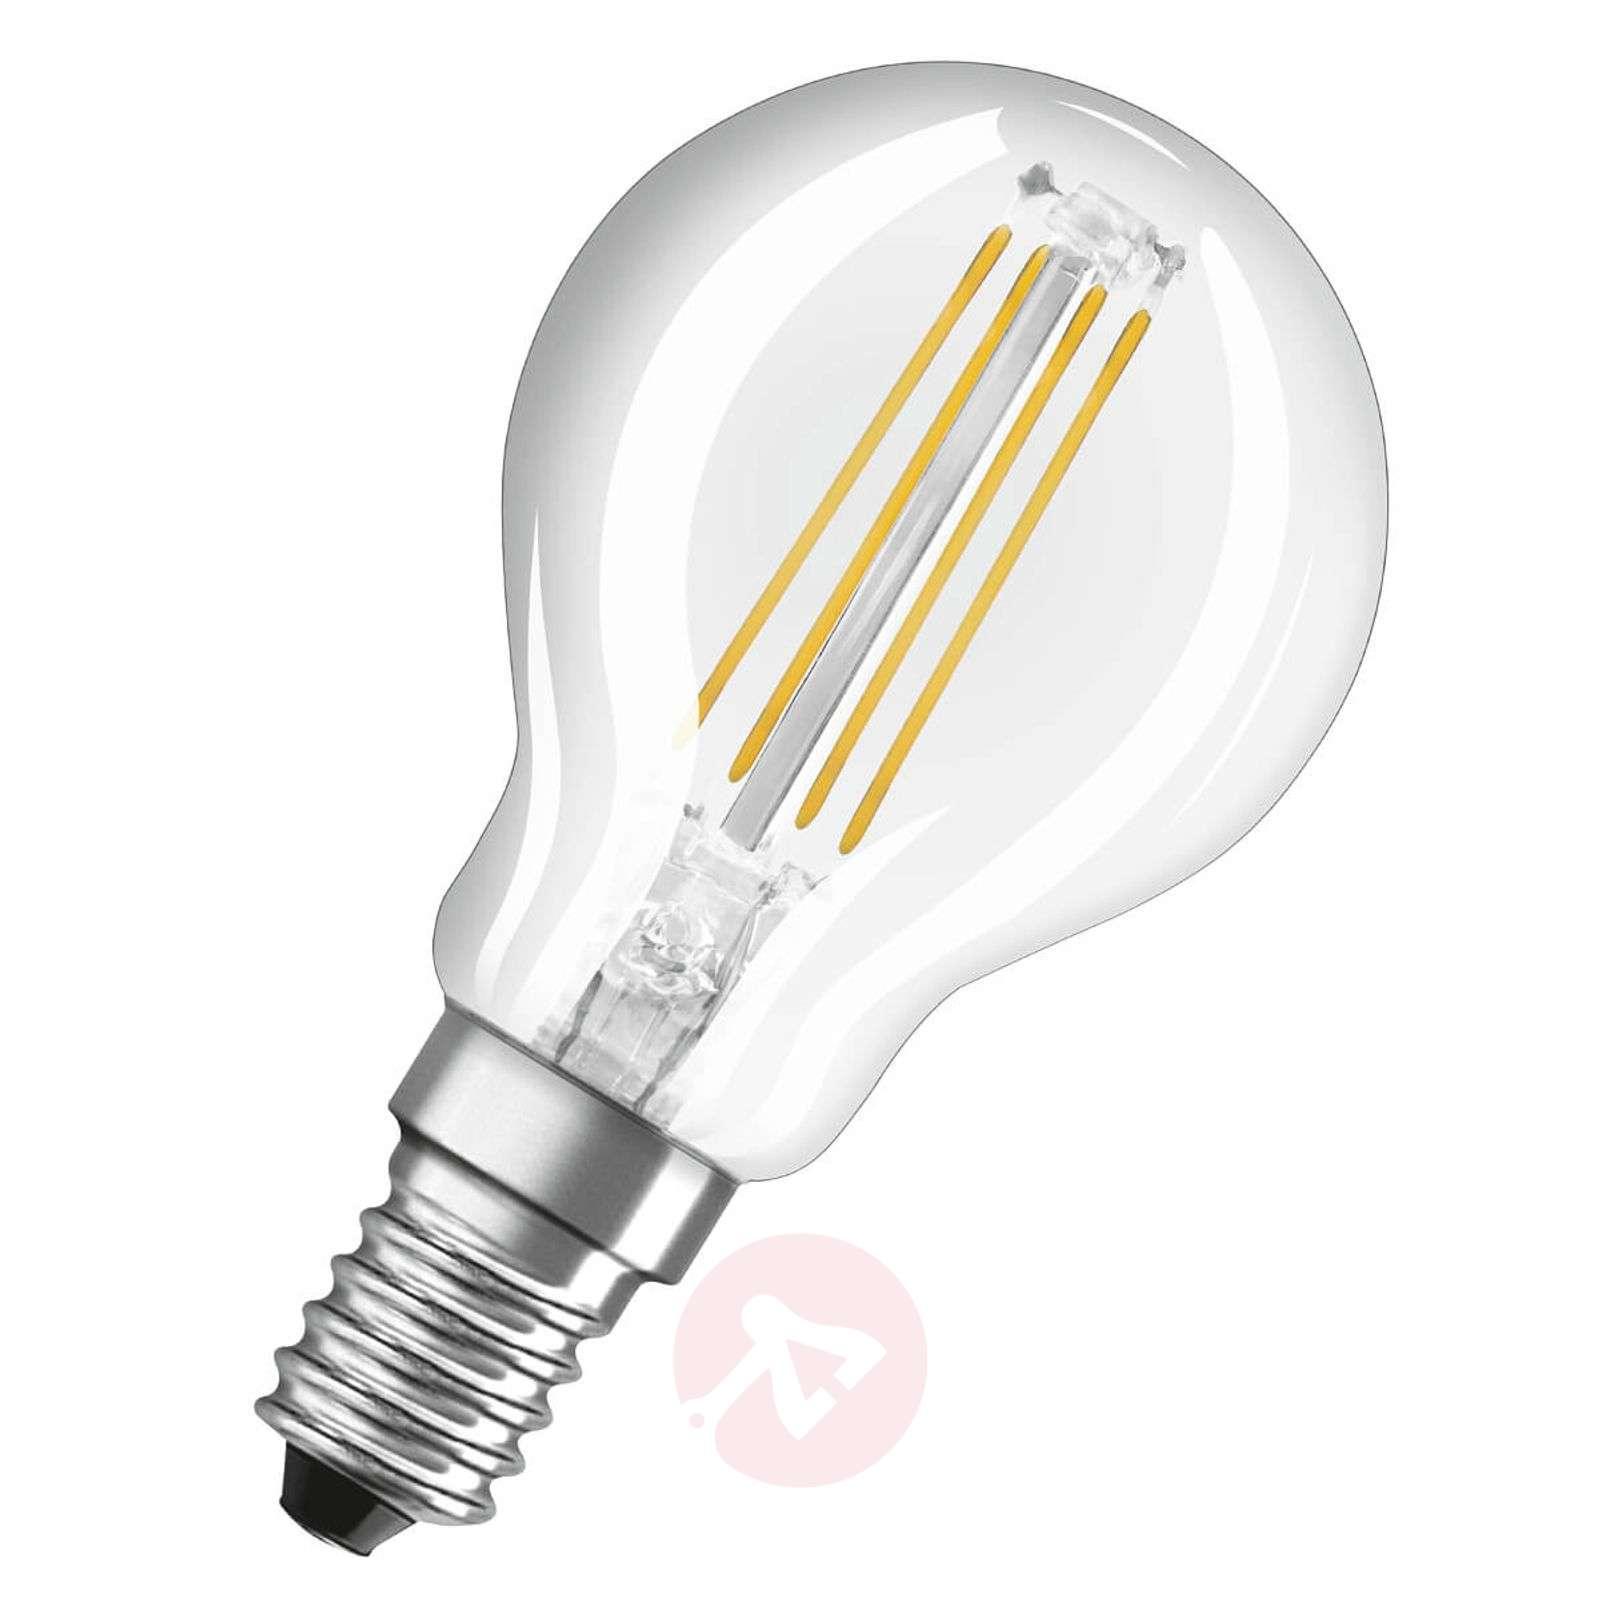 LED filament bulb E14 4 W warm white, set of 3-7262099-01